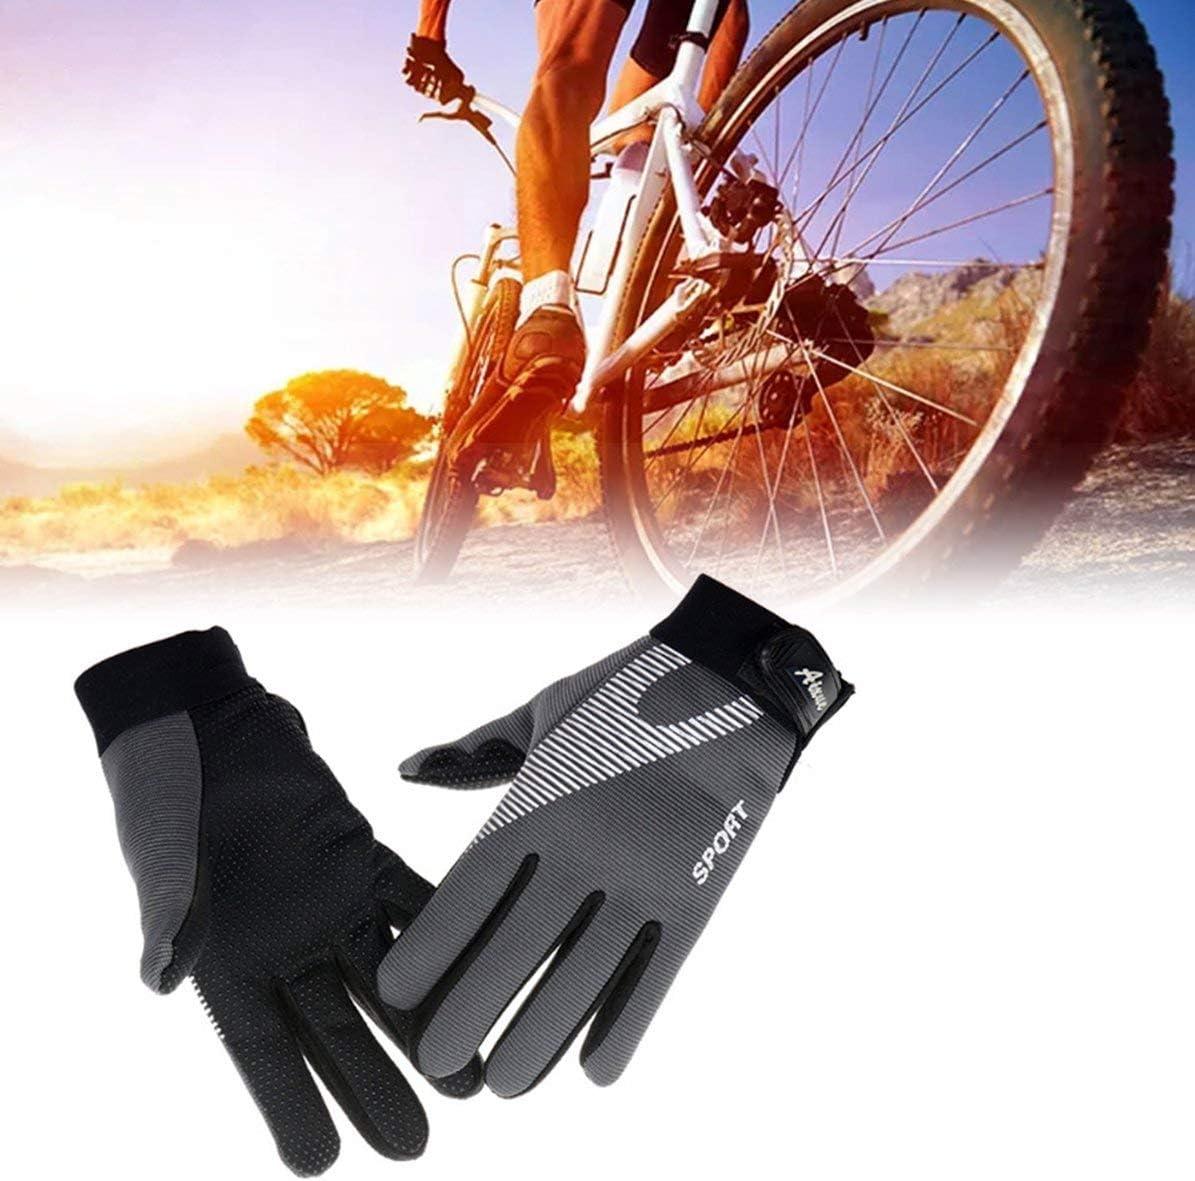 Gris Sunnyflowk Guantes de Fitness con Estilo Antideslizantes Guantes de Ciclismo Gruesos a Prueba de Viento Dedo Completo Moda Deportes al Aire Libre Guantes c/álidos